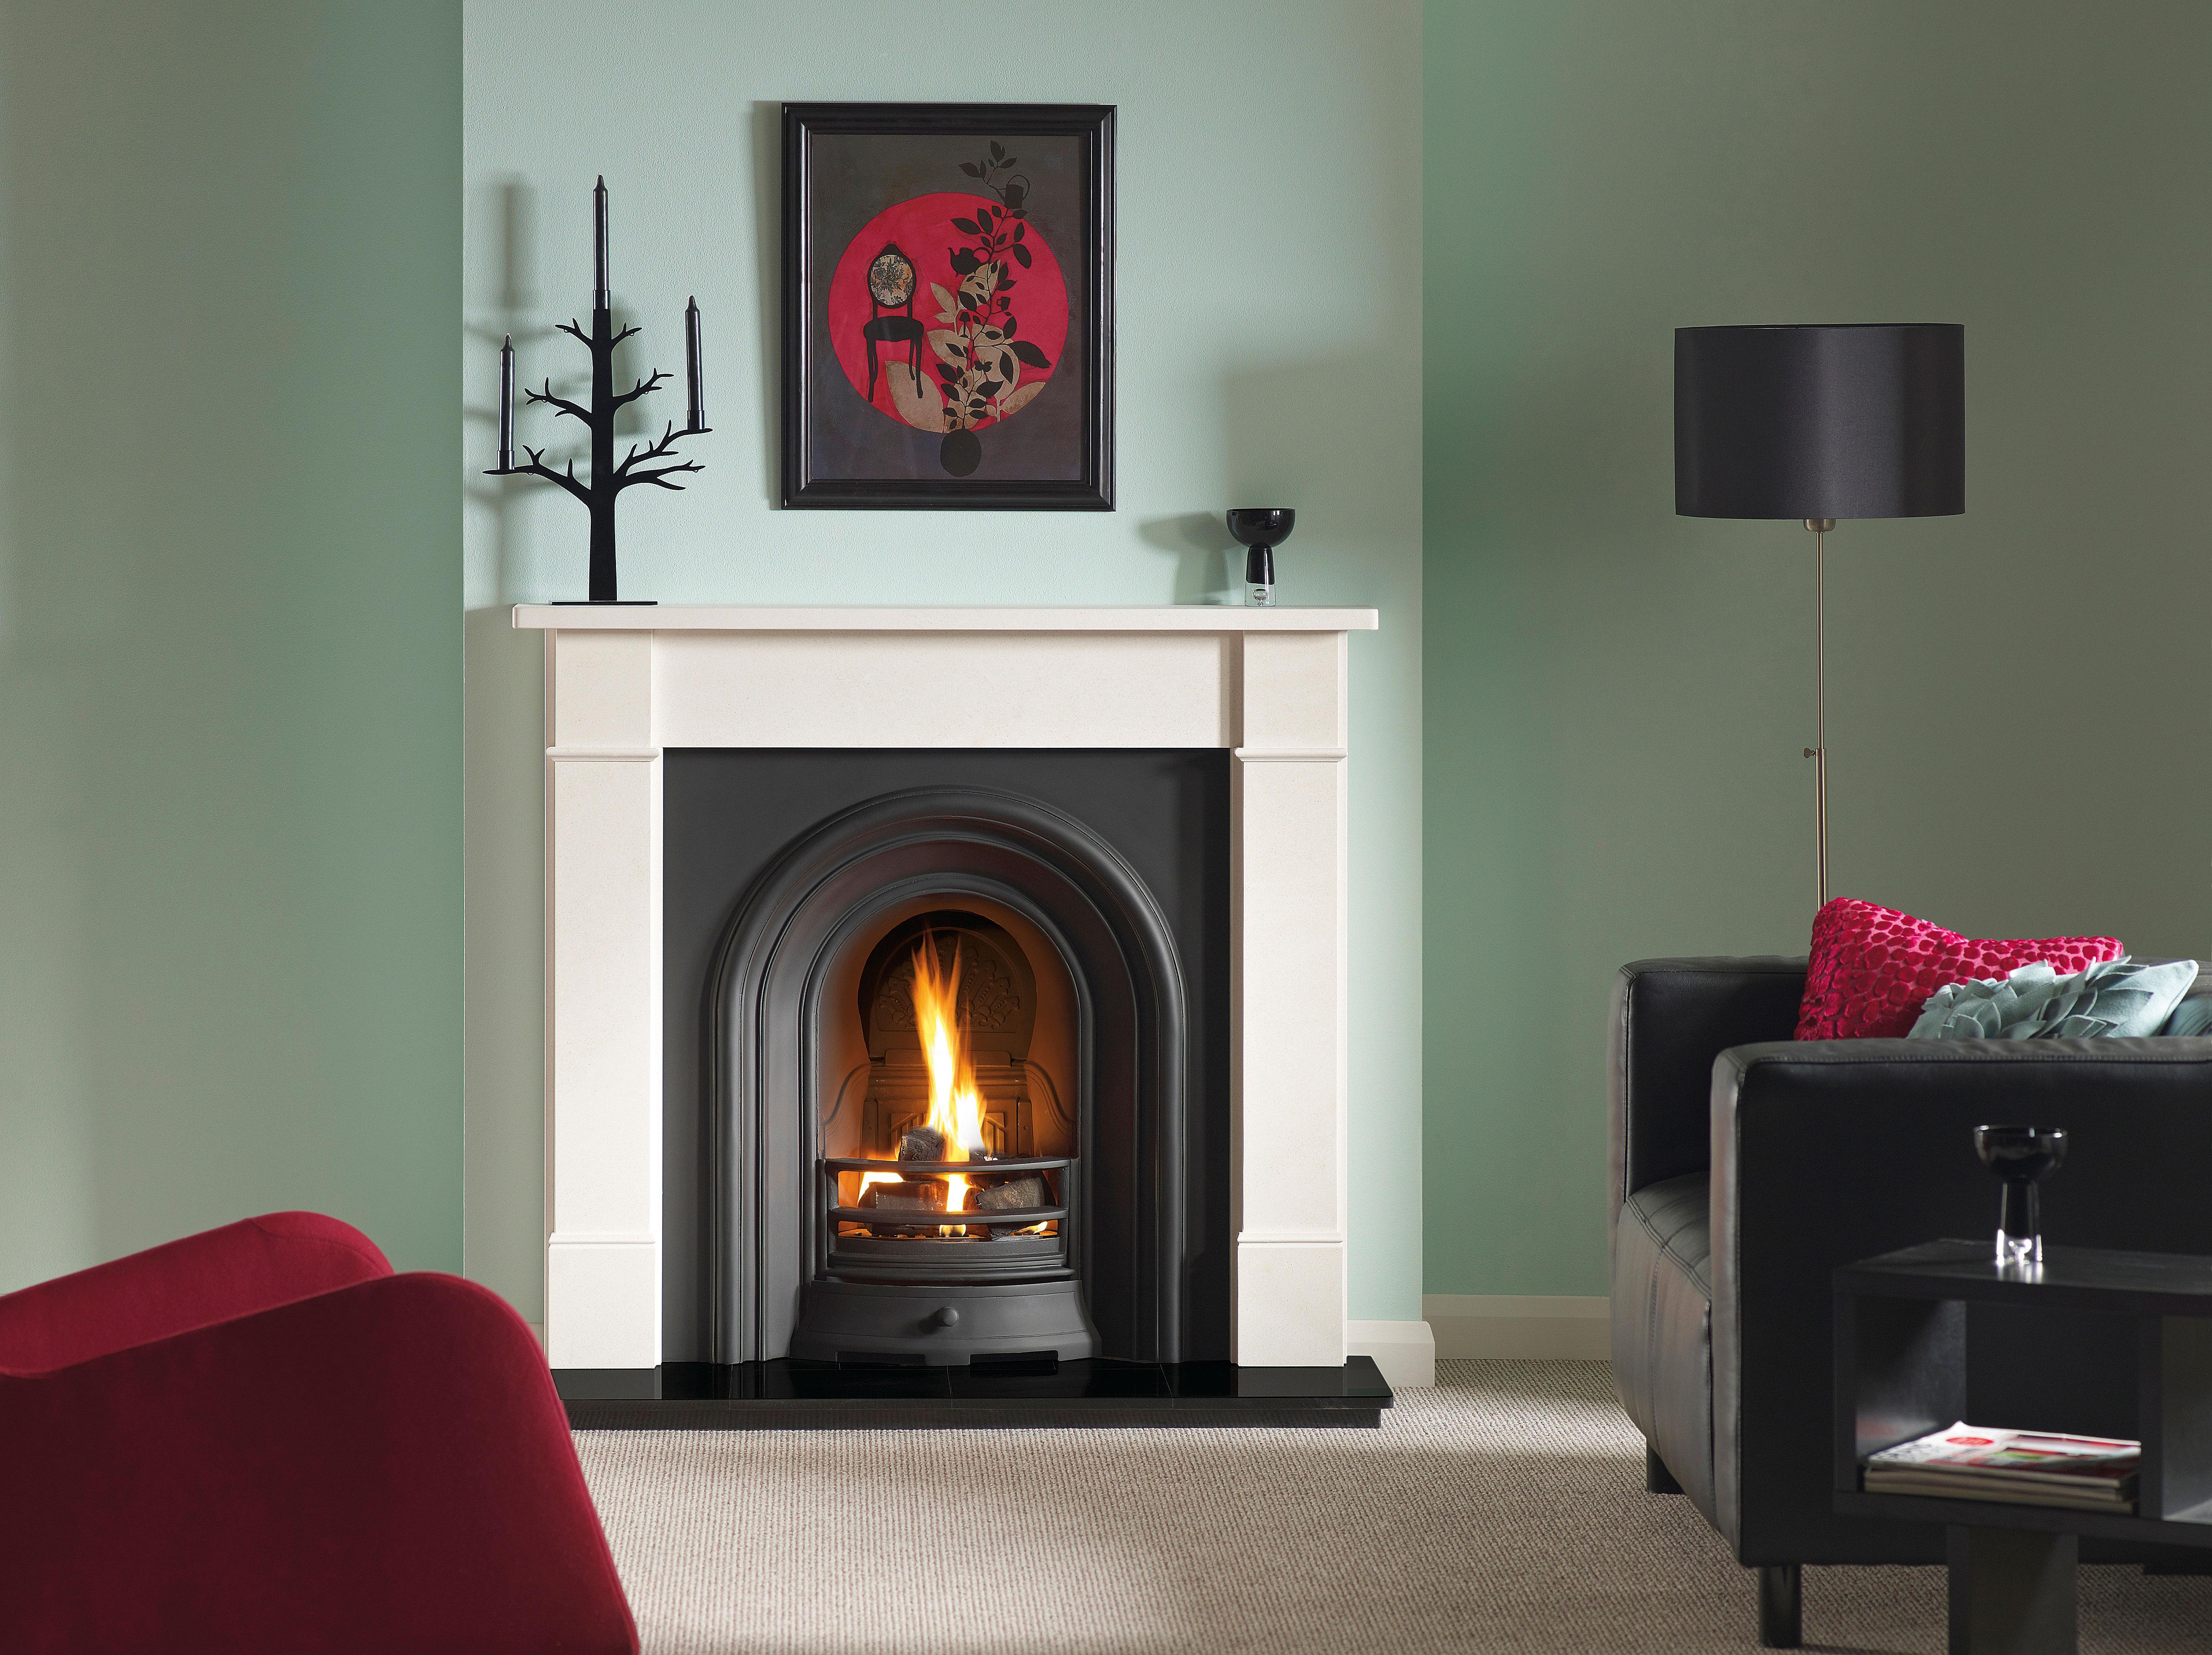 craftstone fireplaces